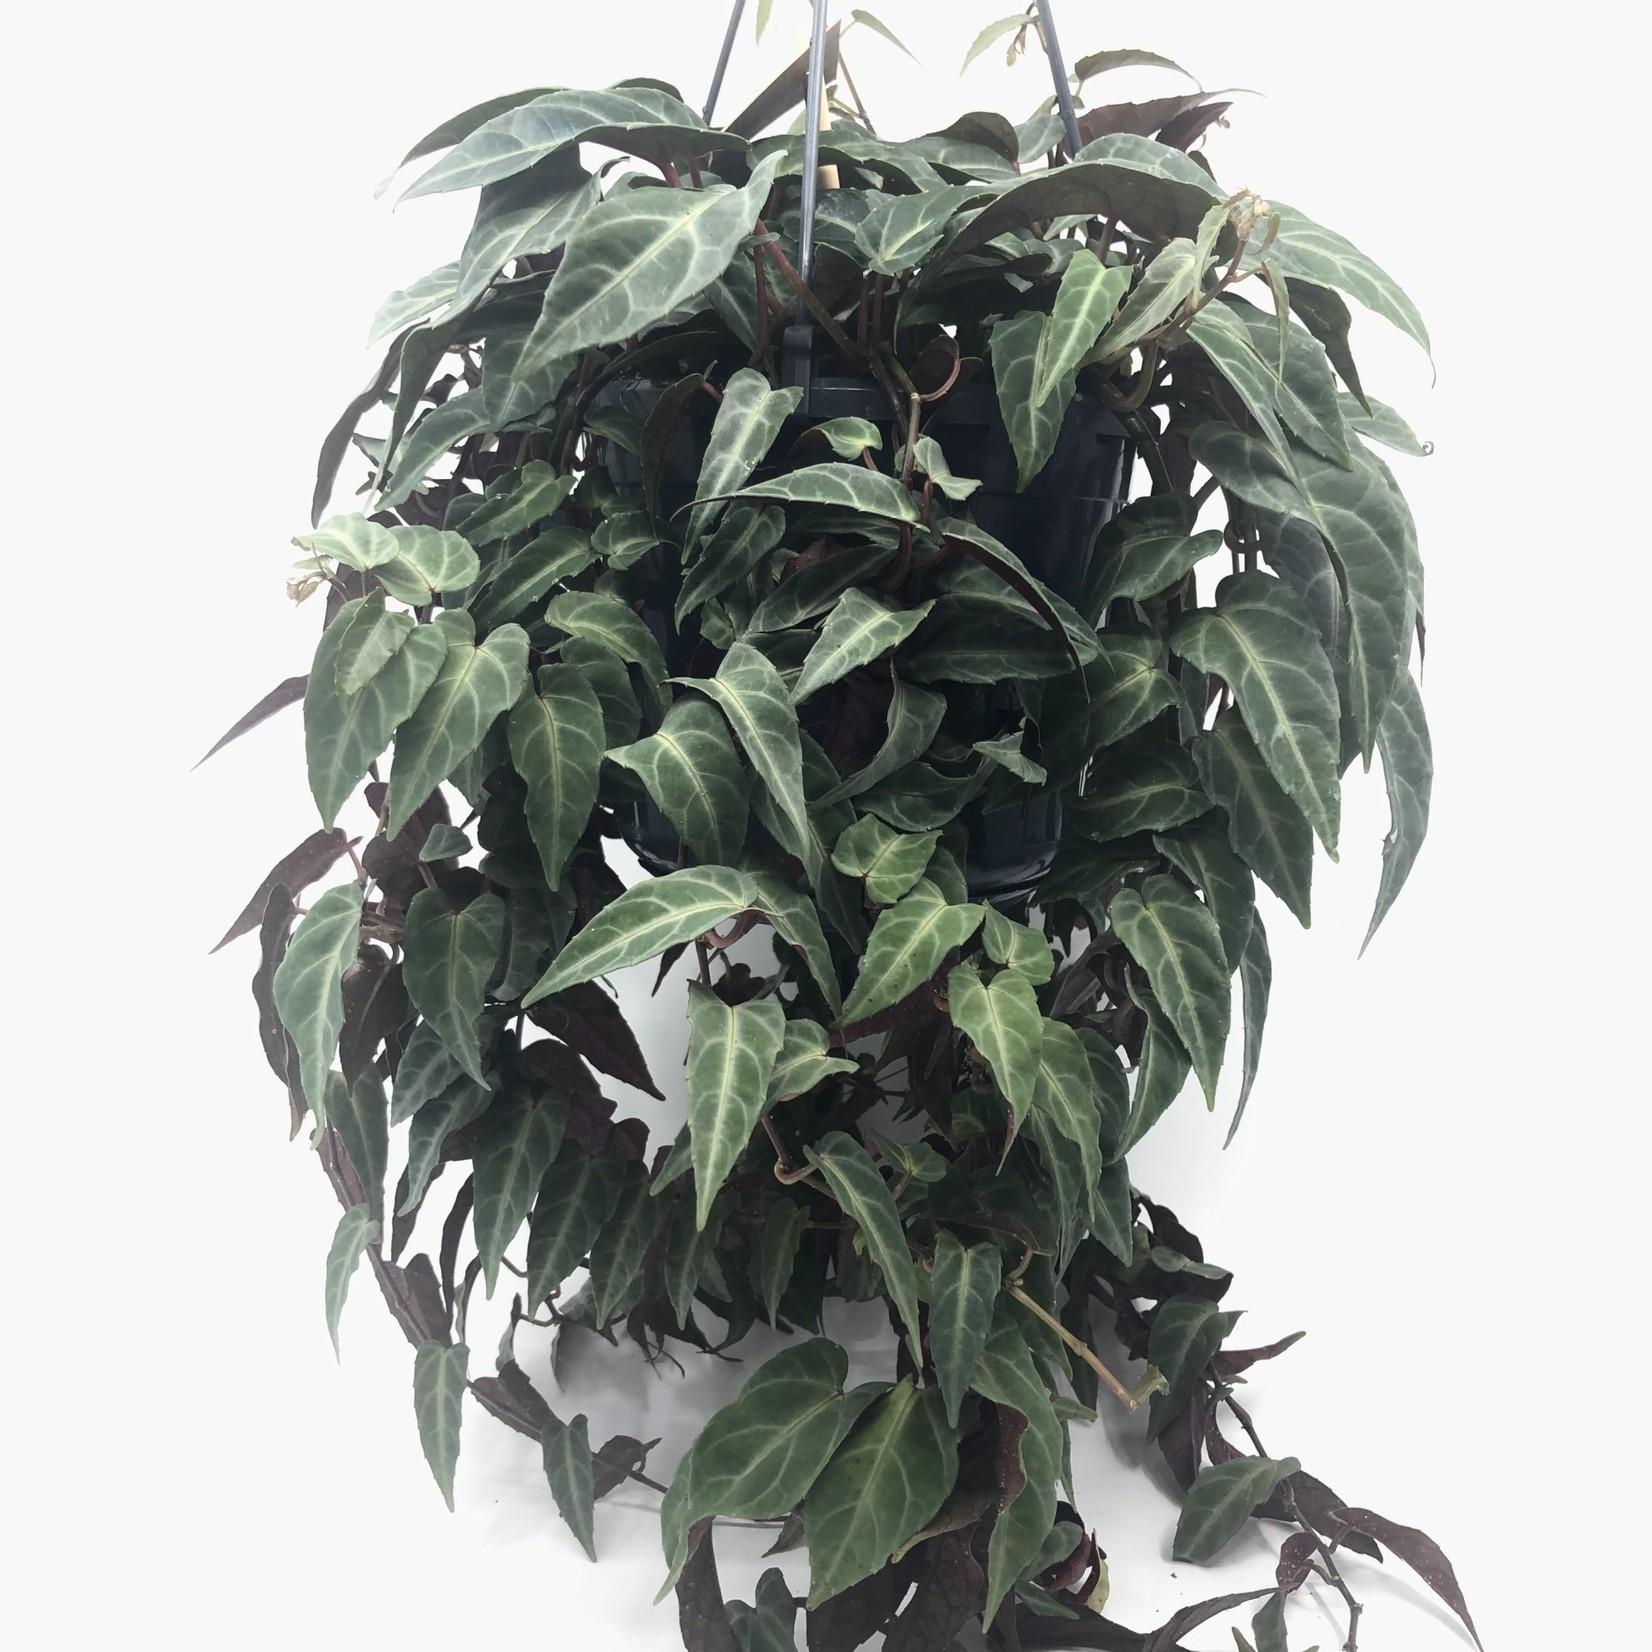 Parthenocissus amazonica